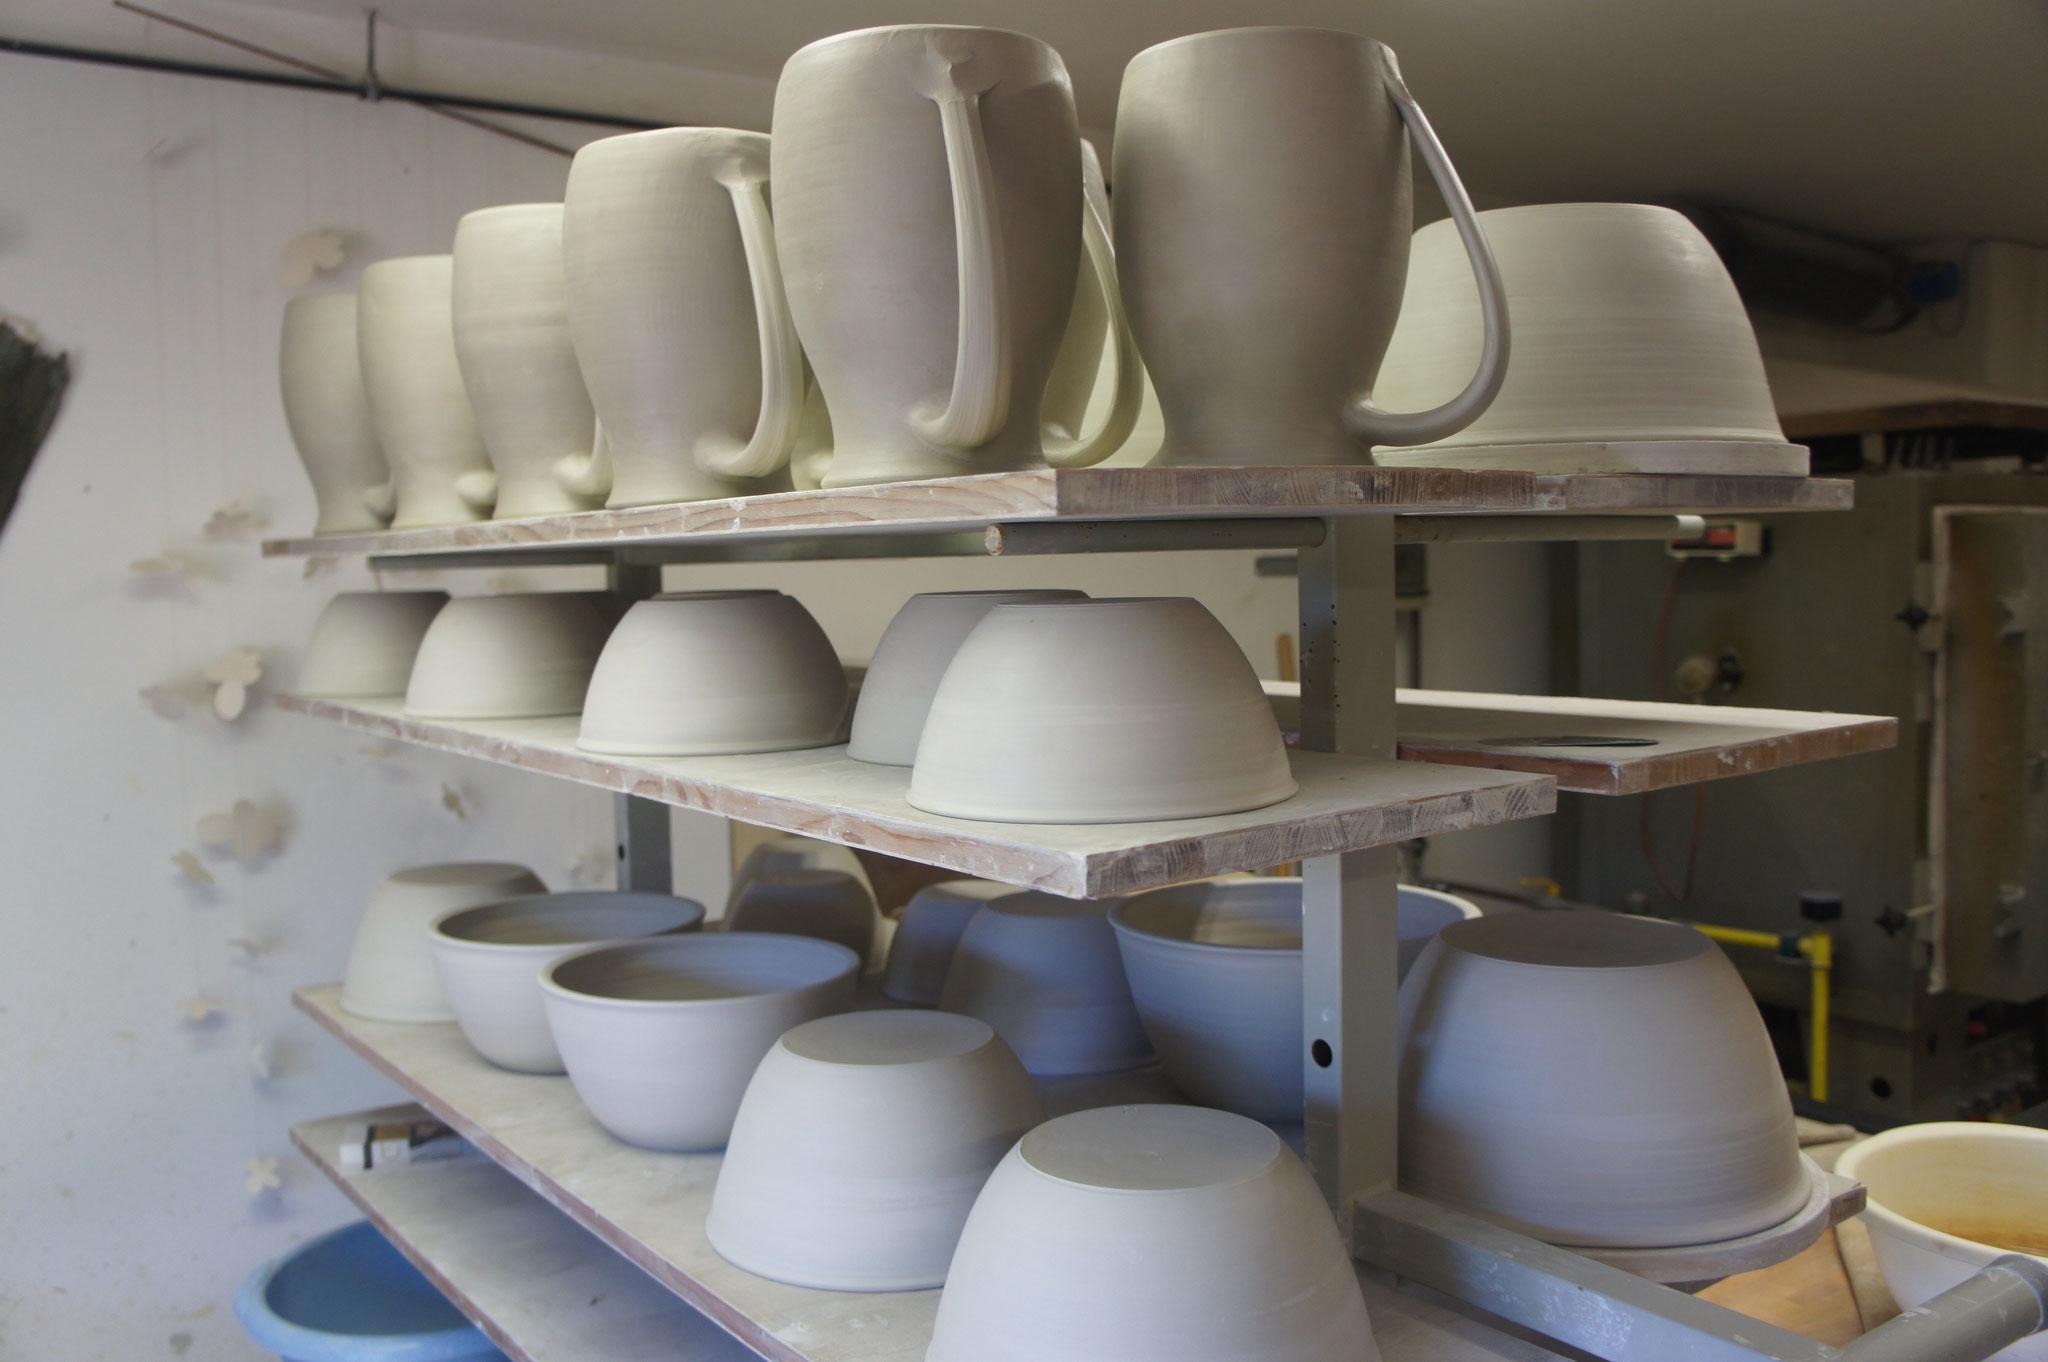 Keramikwerkstatt TON ART im Haus